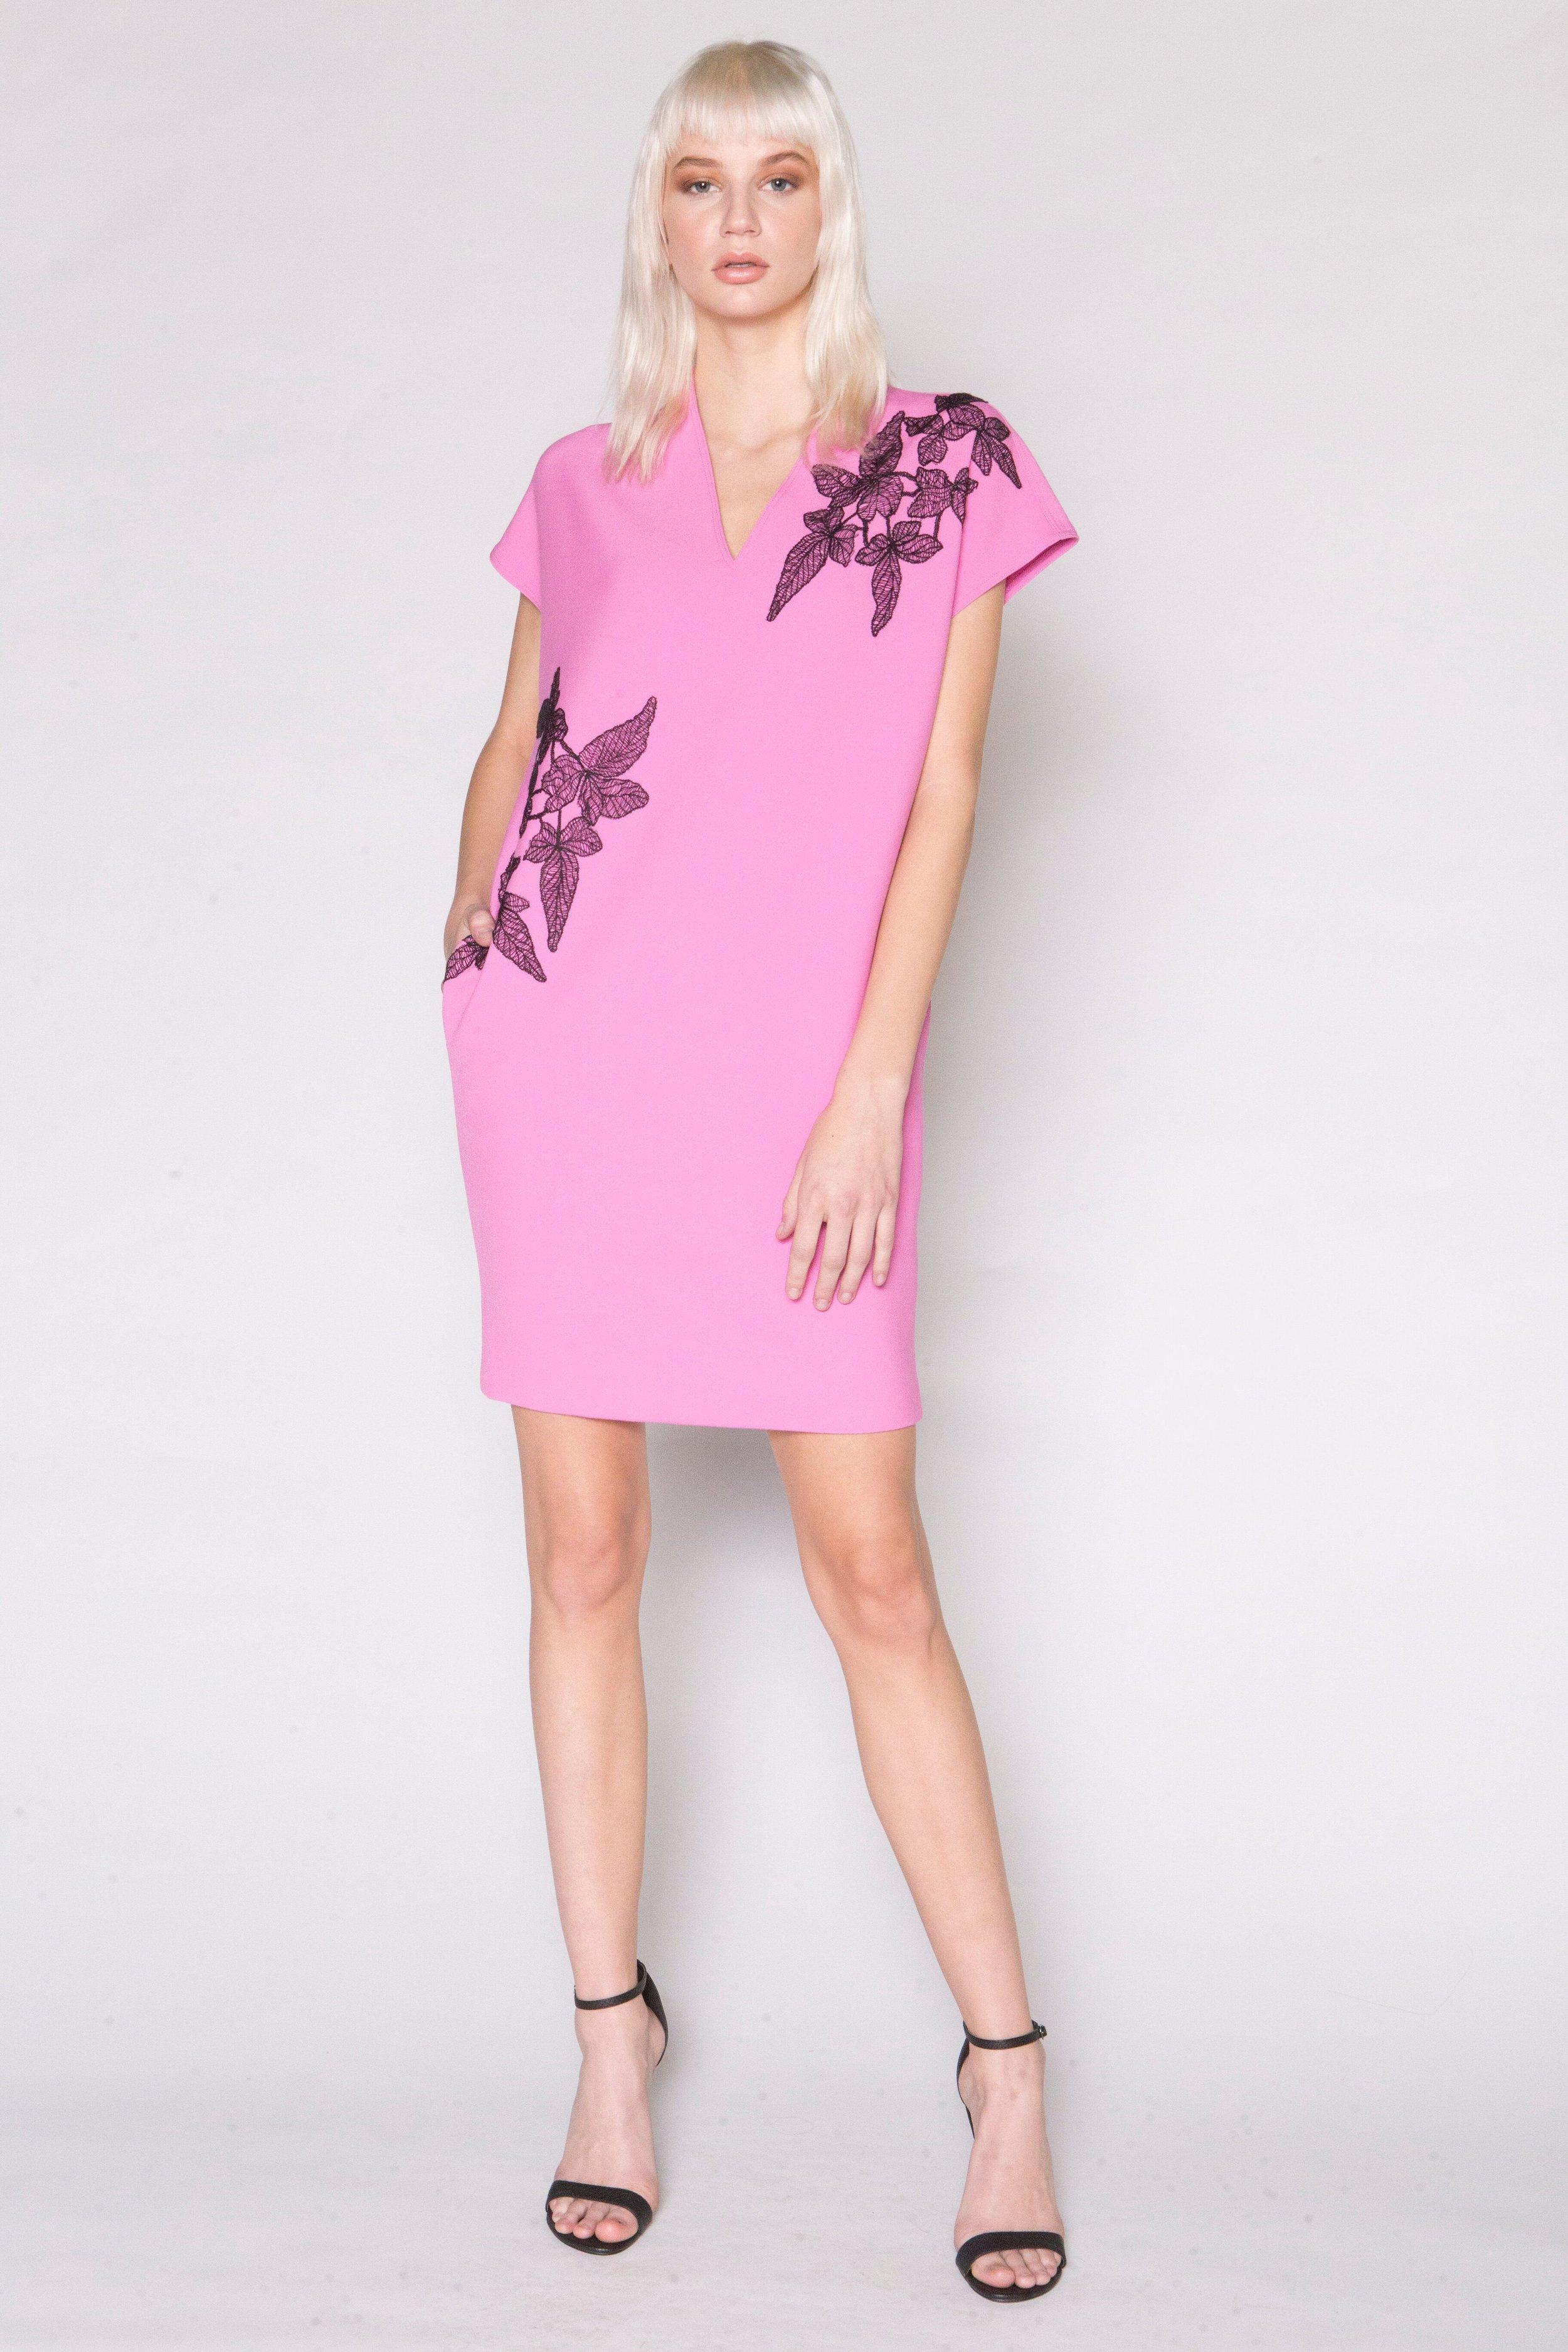 Pink Wedge Dress w/Blk Floral Applique